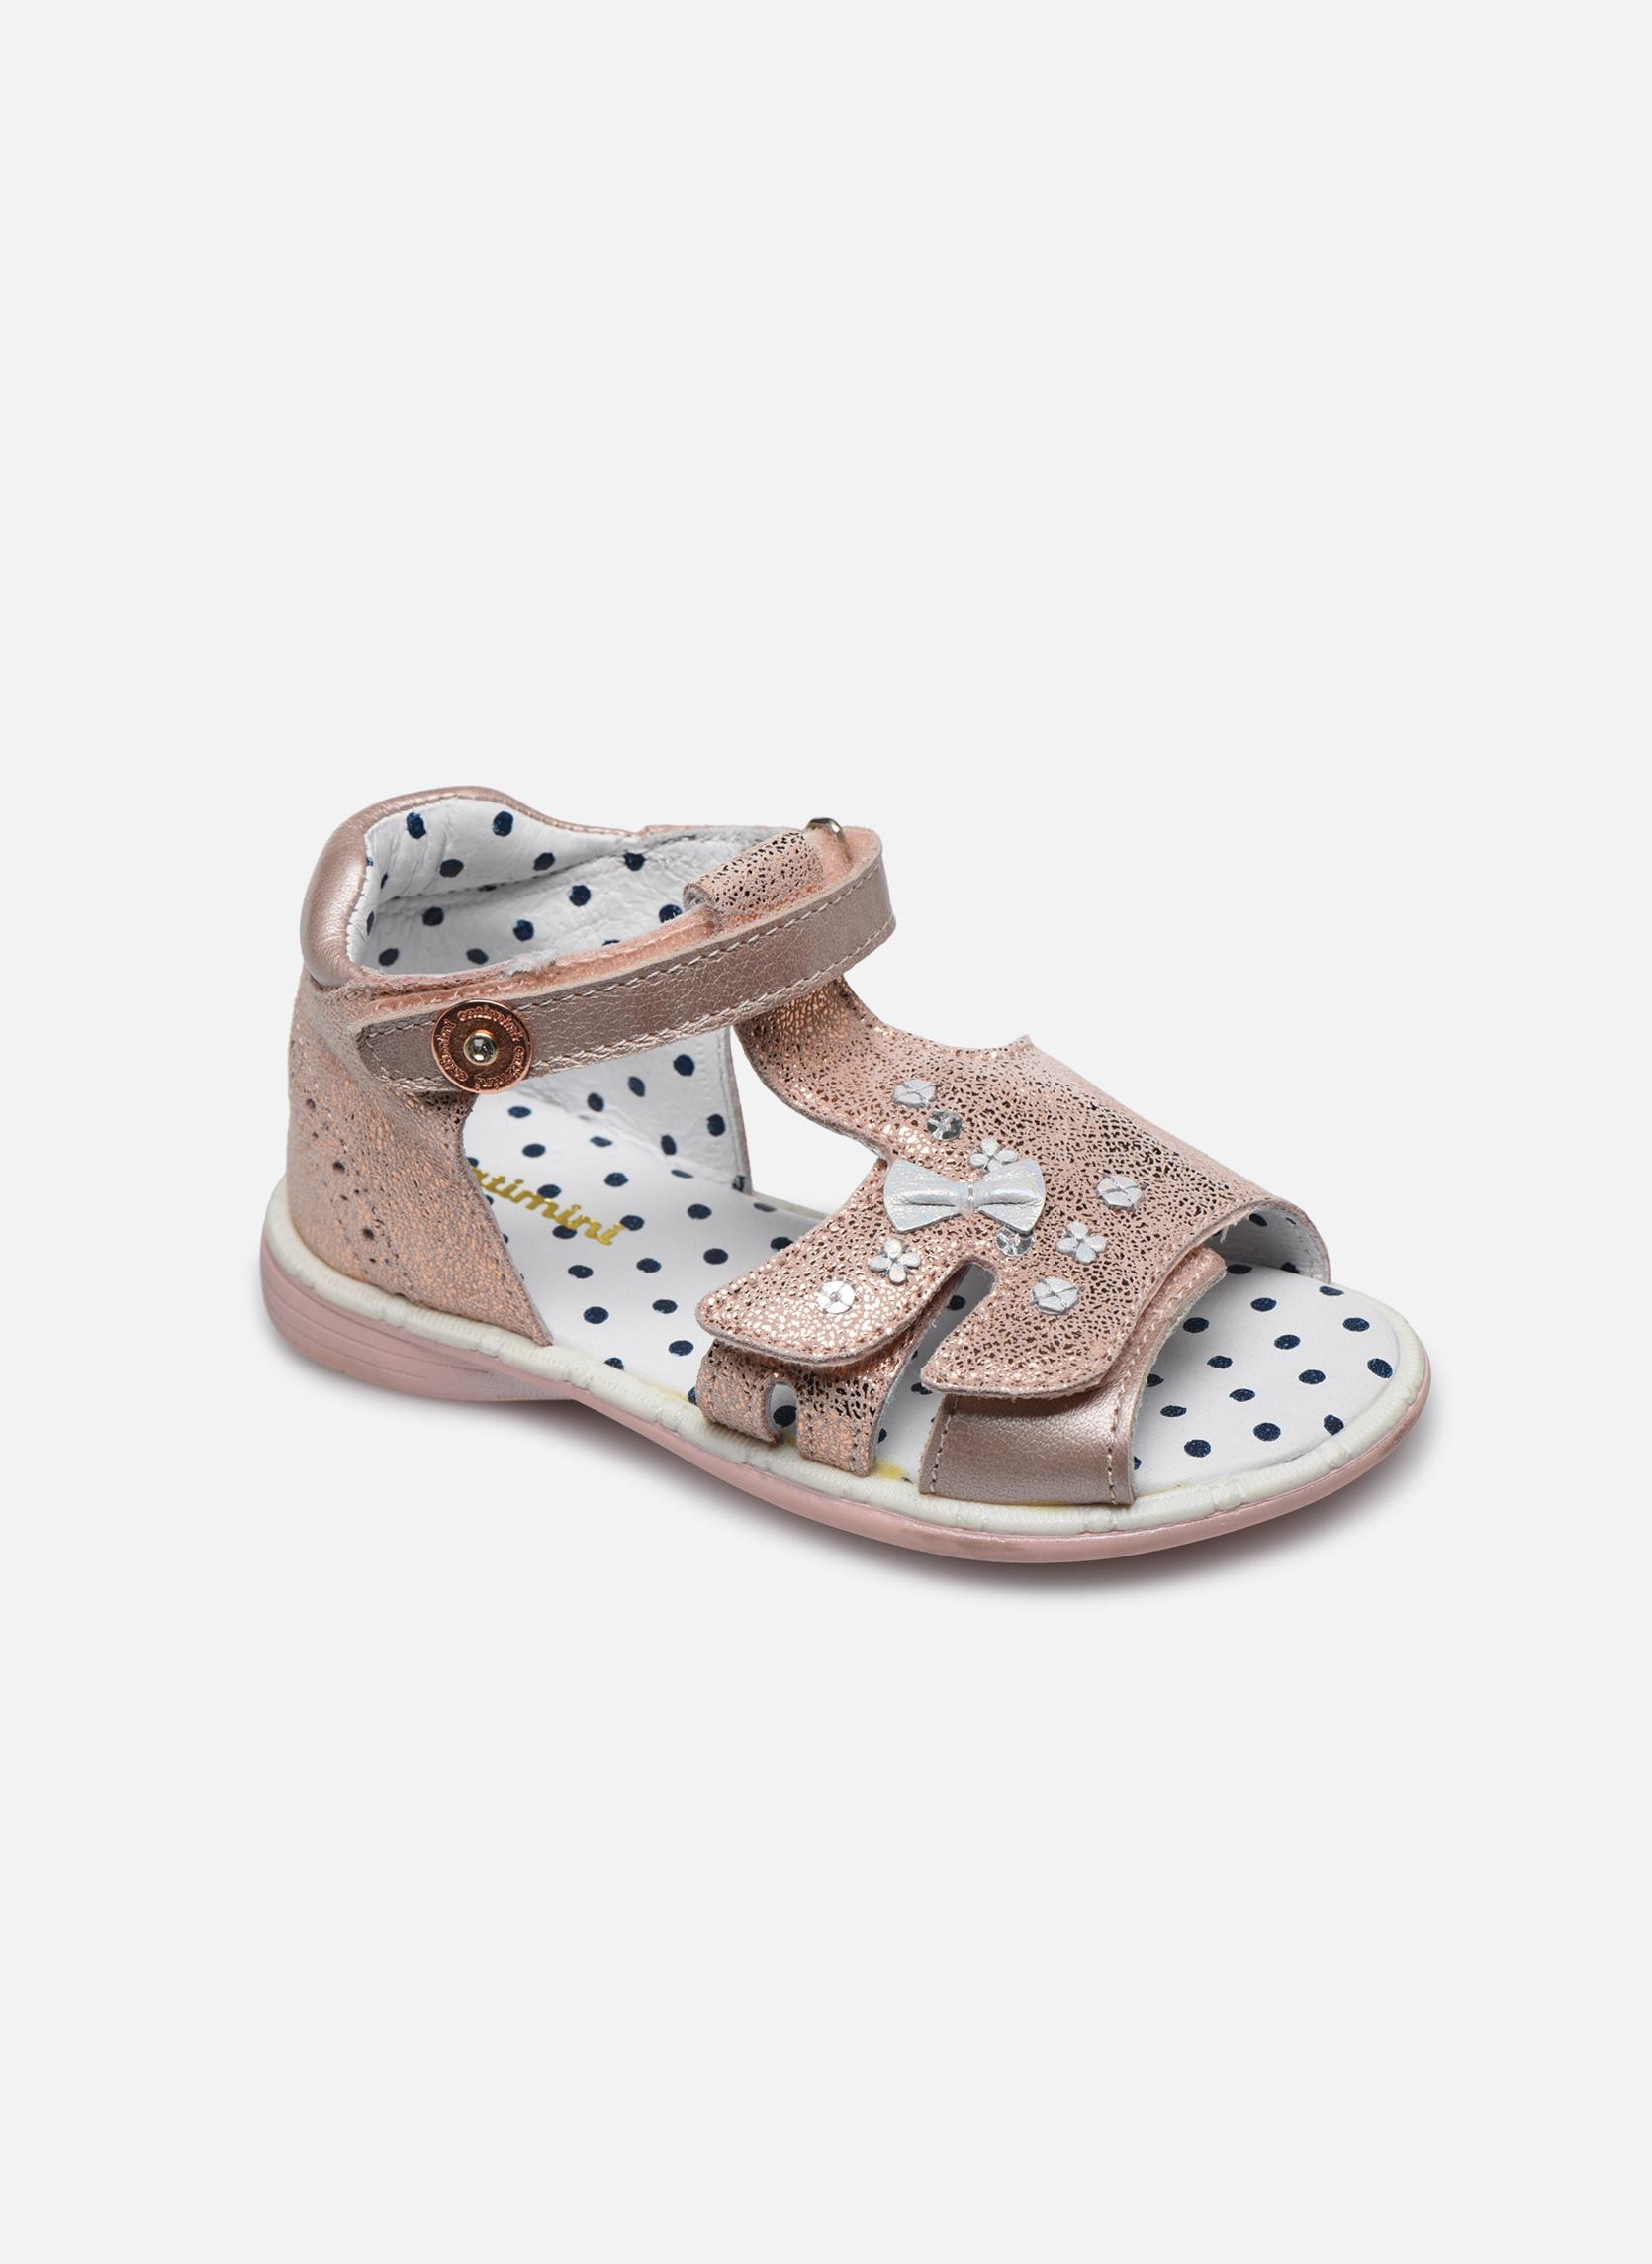 Sandals Children Puce